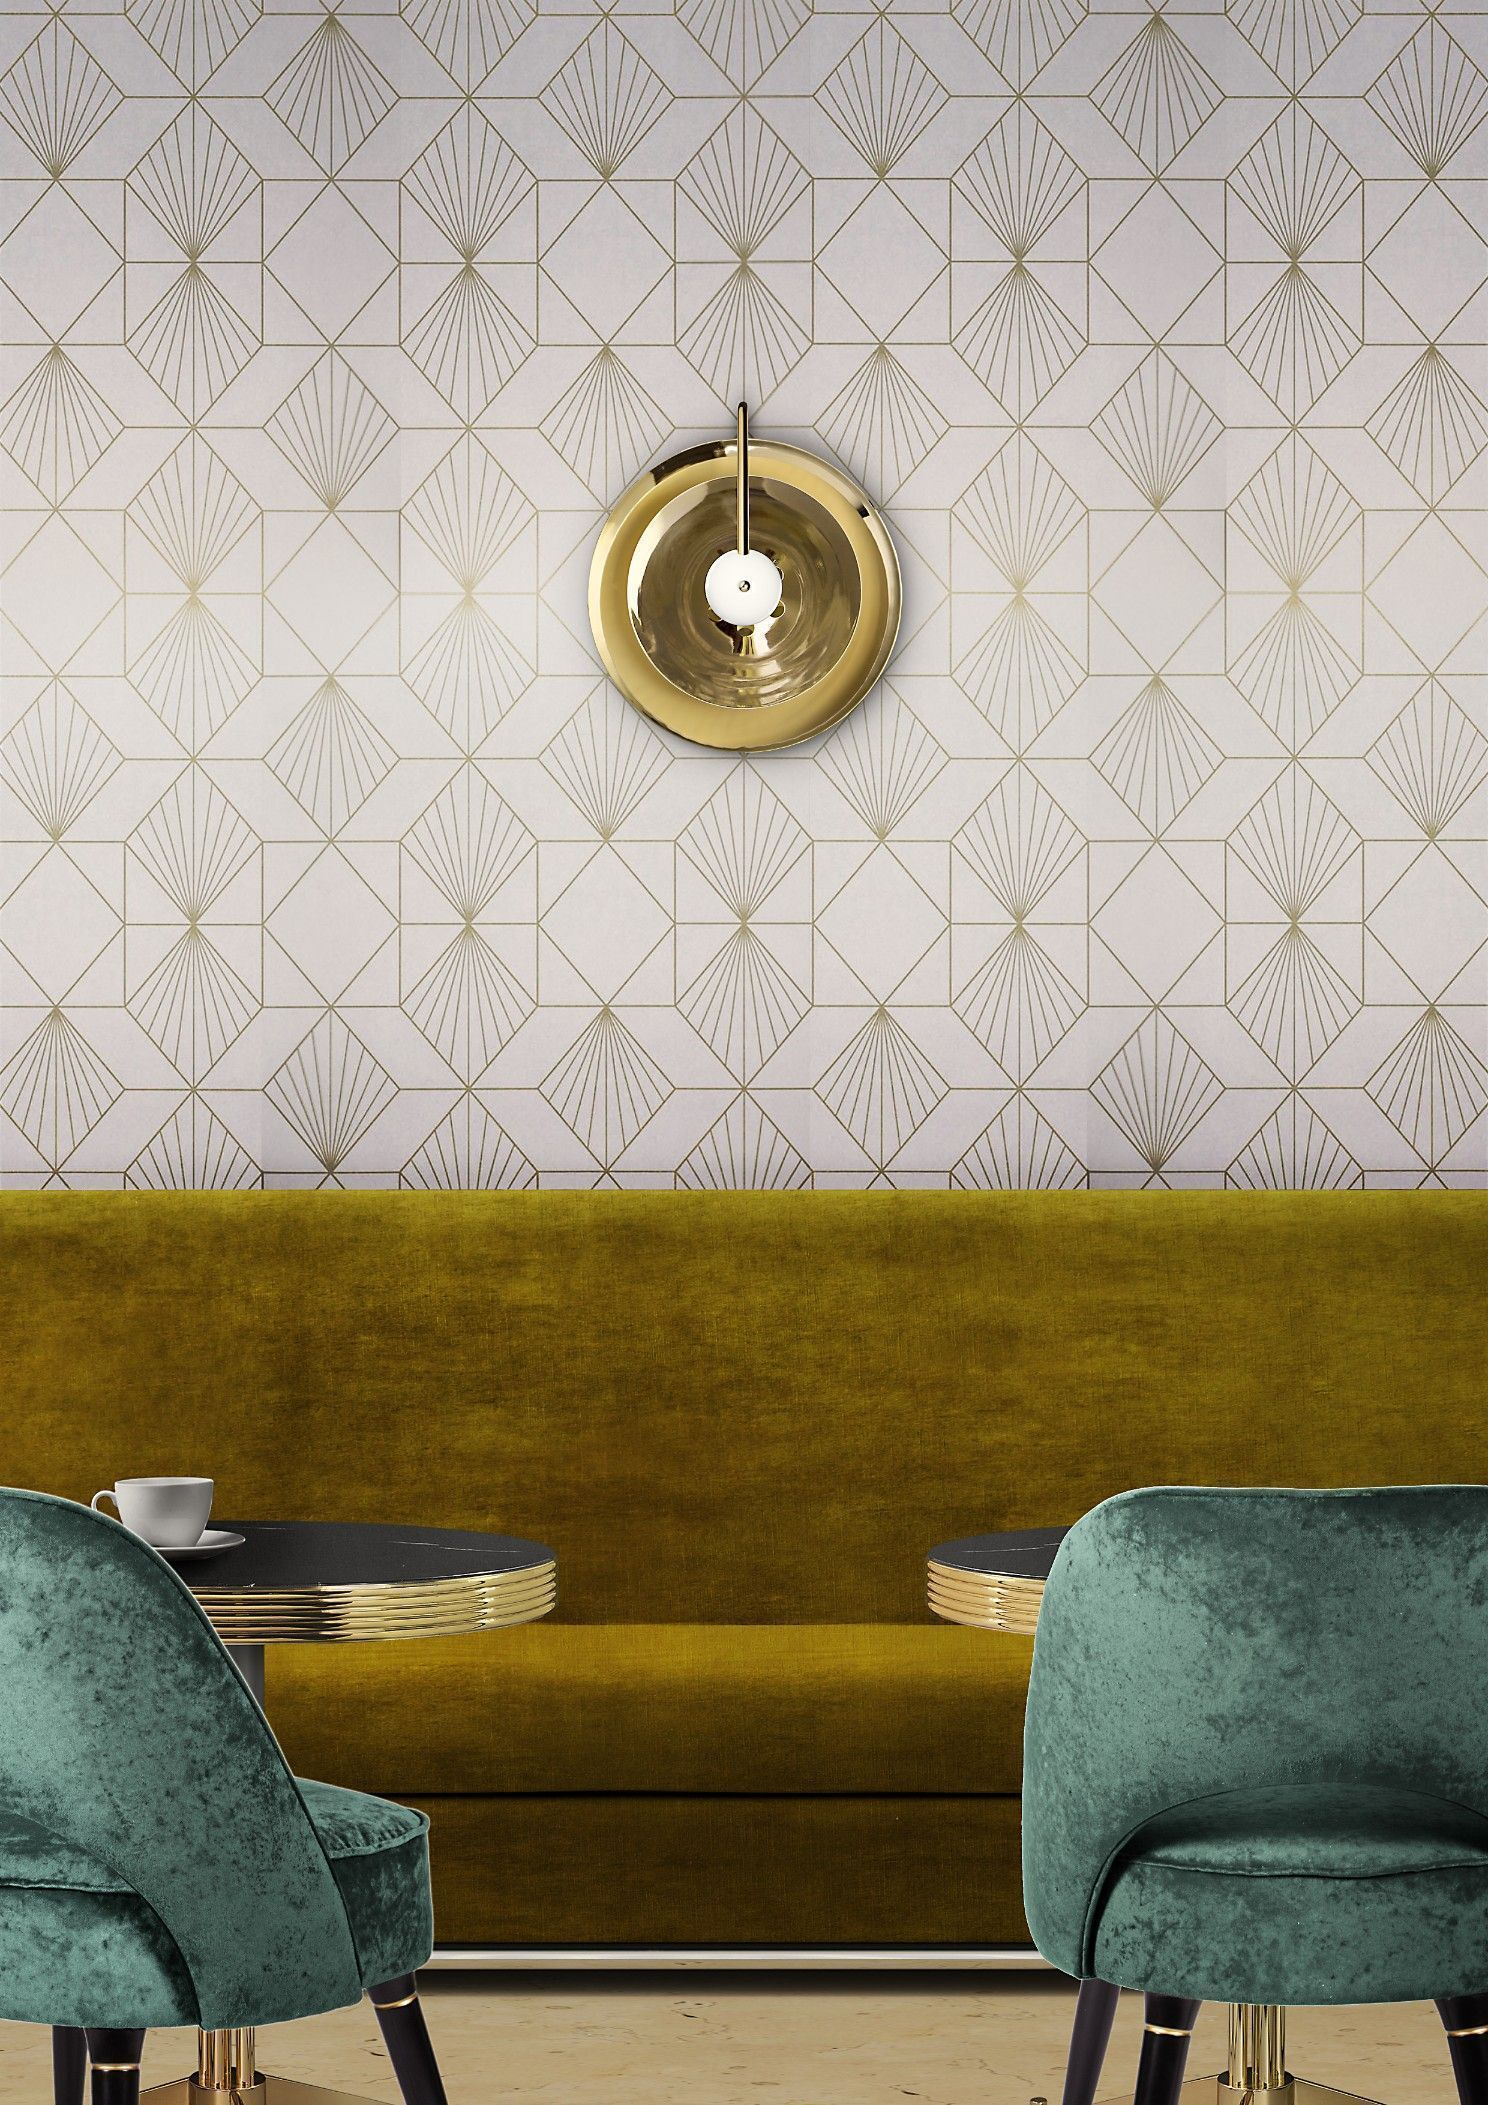 USA contemporary home decor and mid century modern